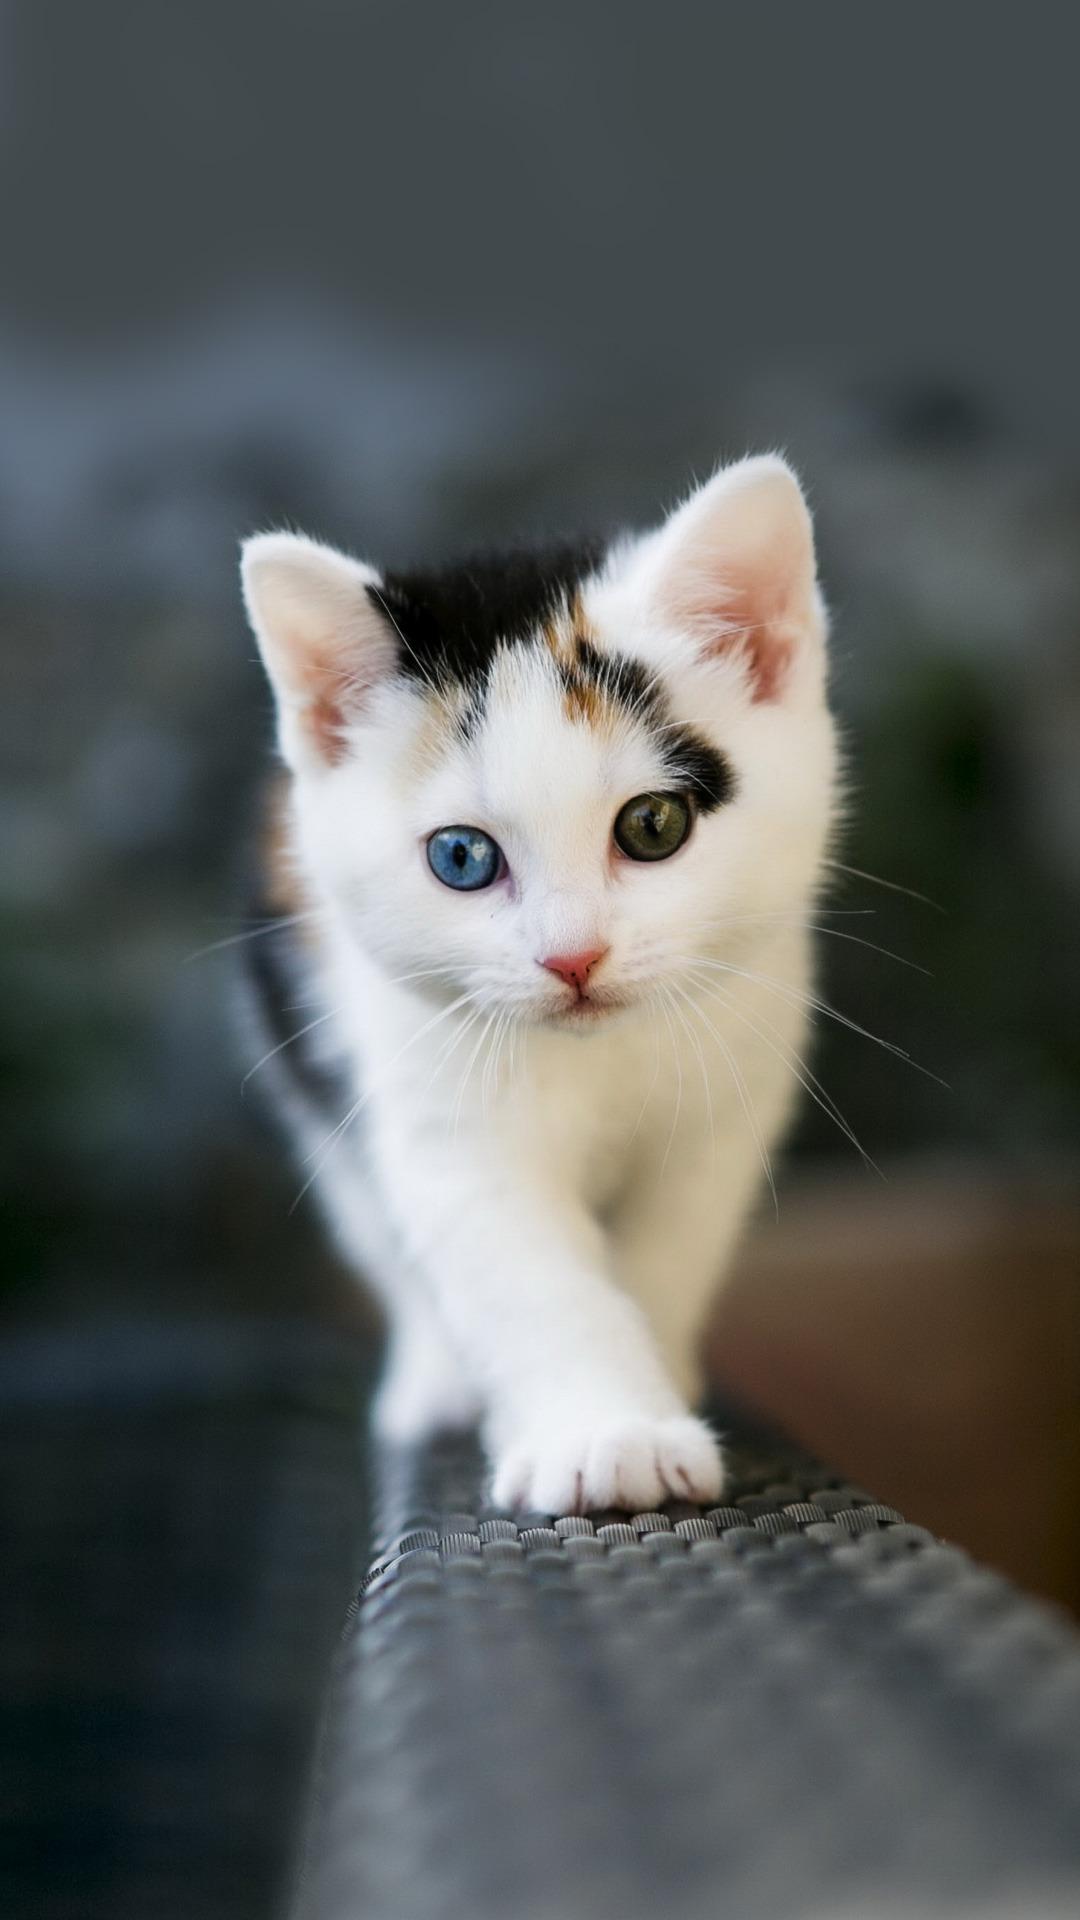 Odd Eyed Kitten IPhone Wallpaper